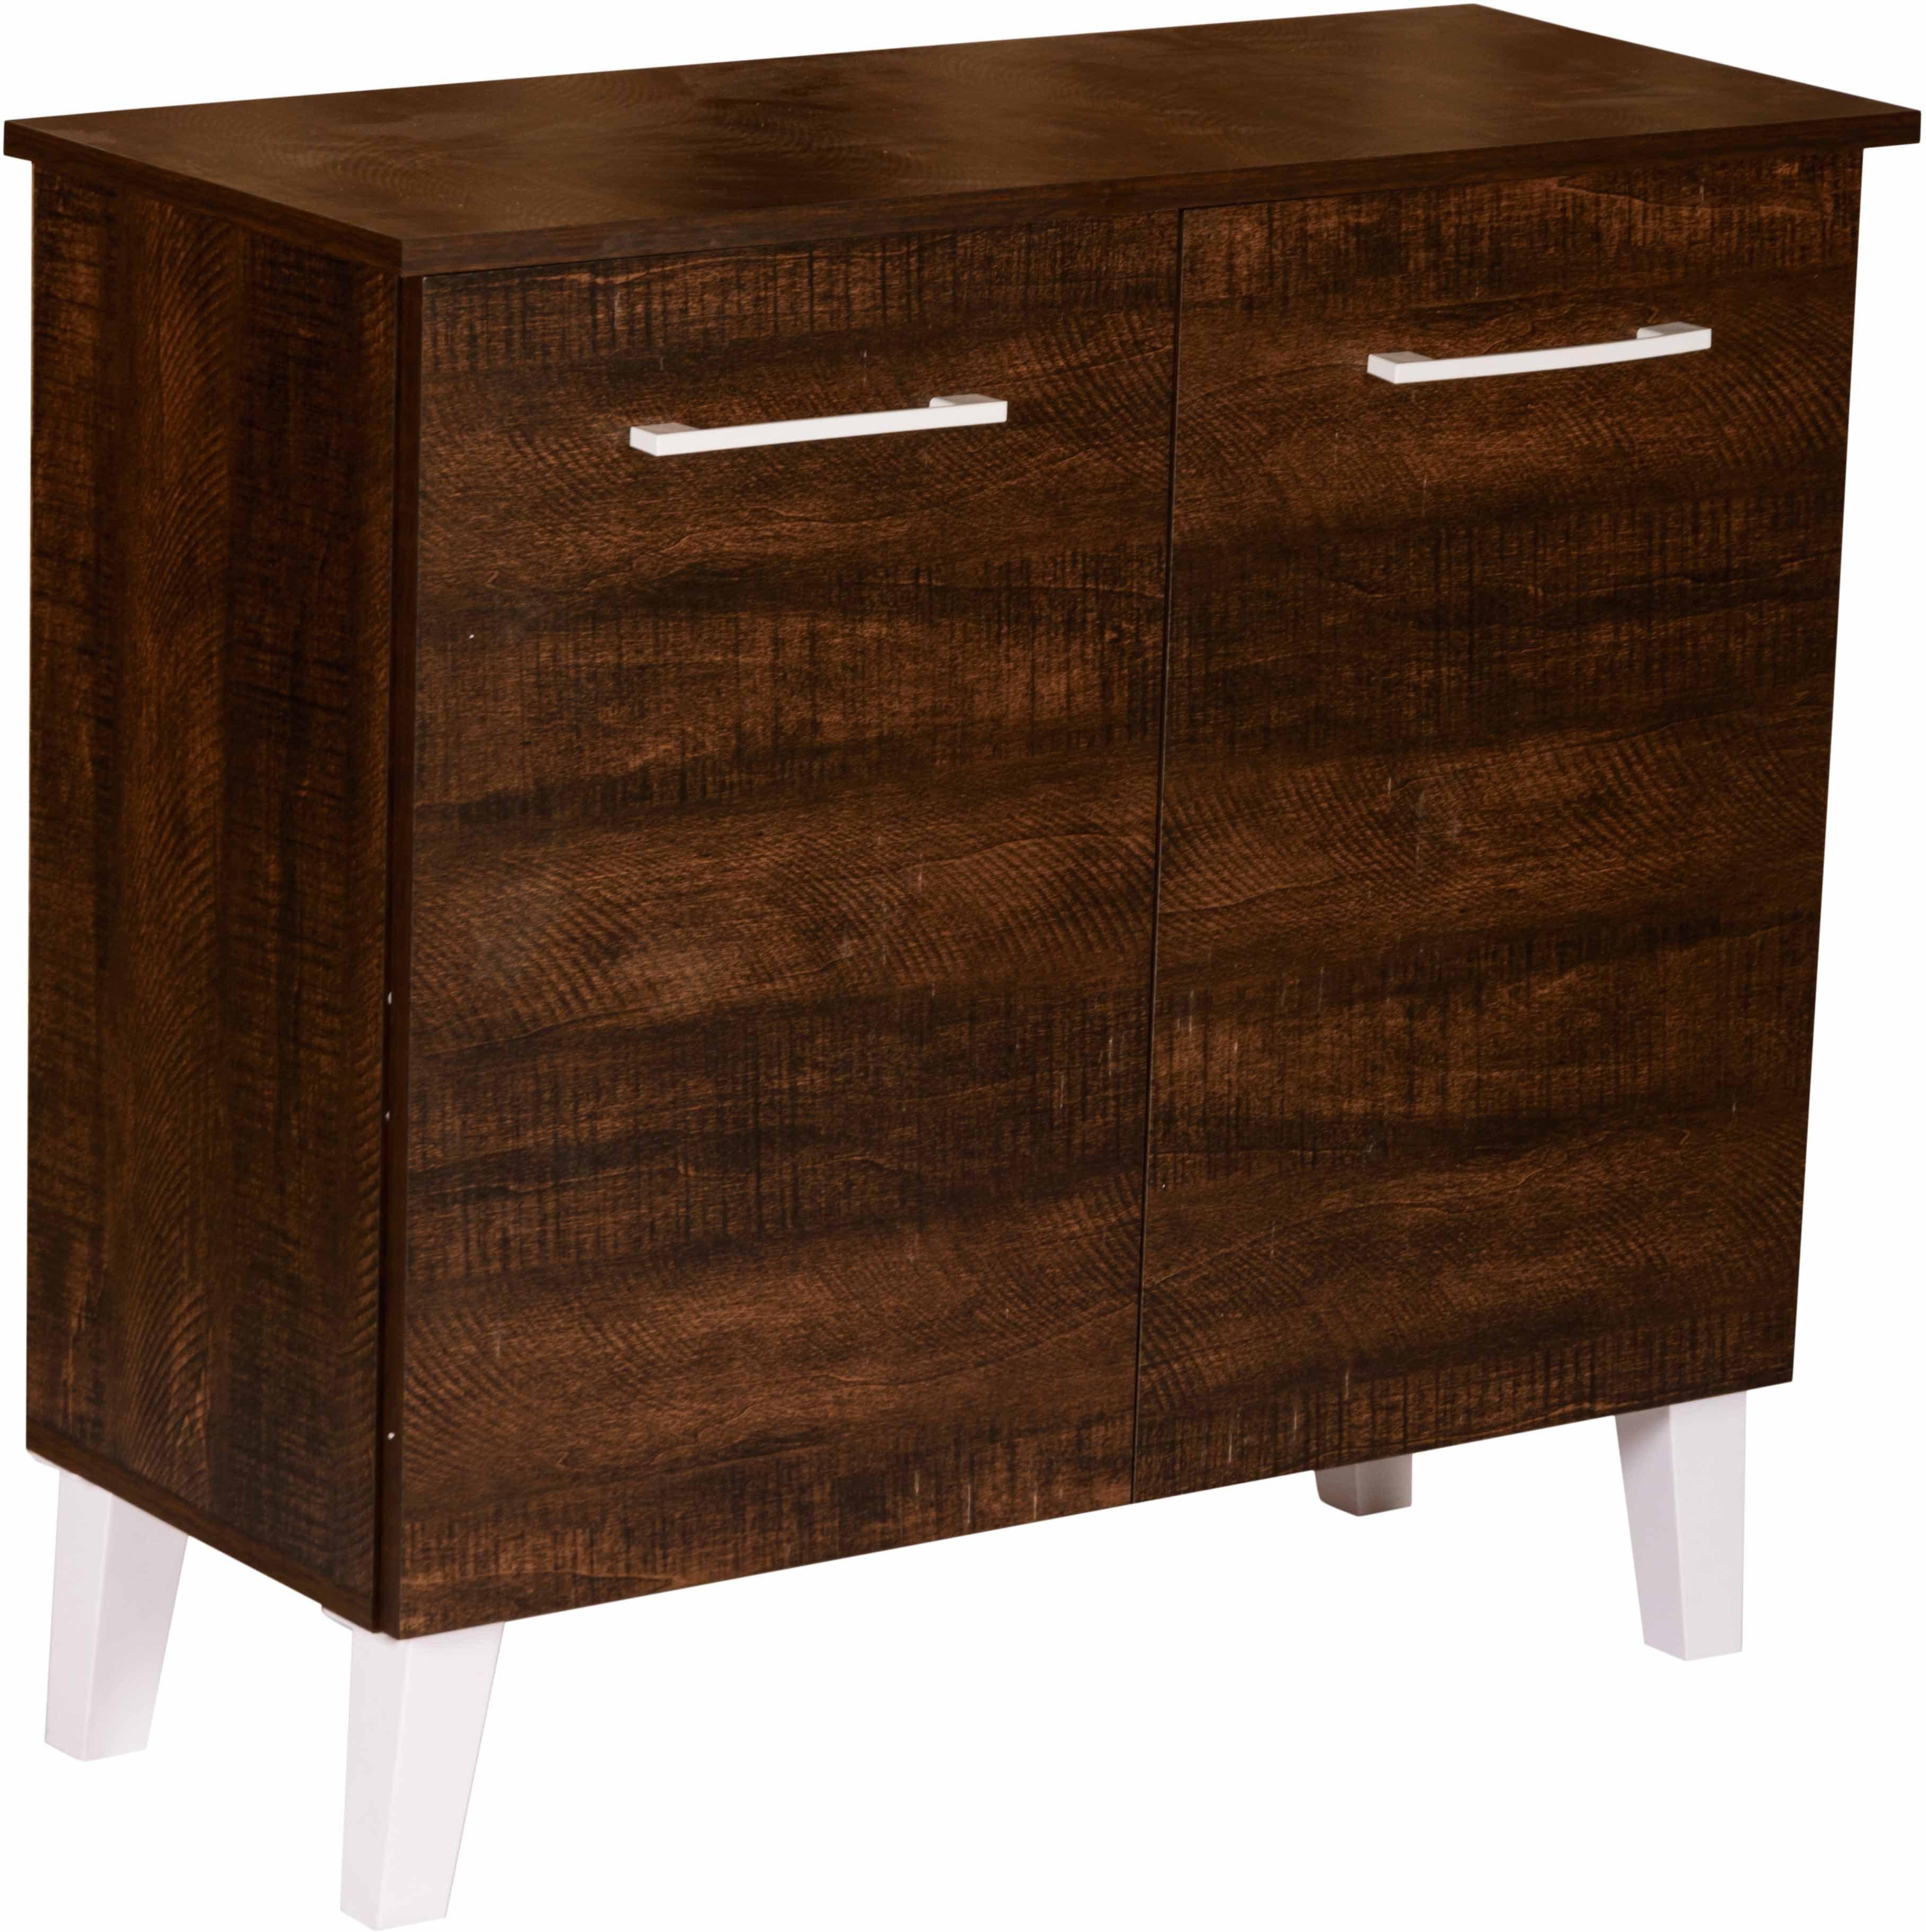 View DeckUp Engineered Wood Shoe Cabinet(Brown, 3 Shelves) Furniture (DeckUp)